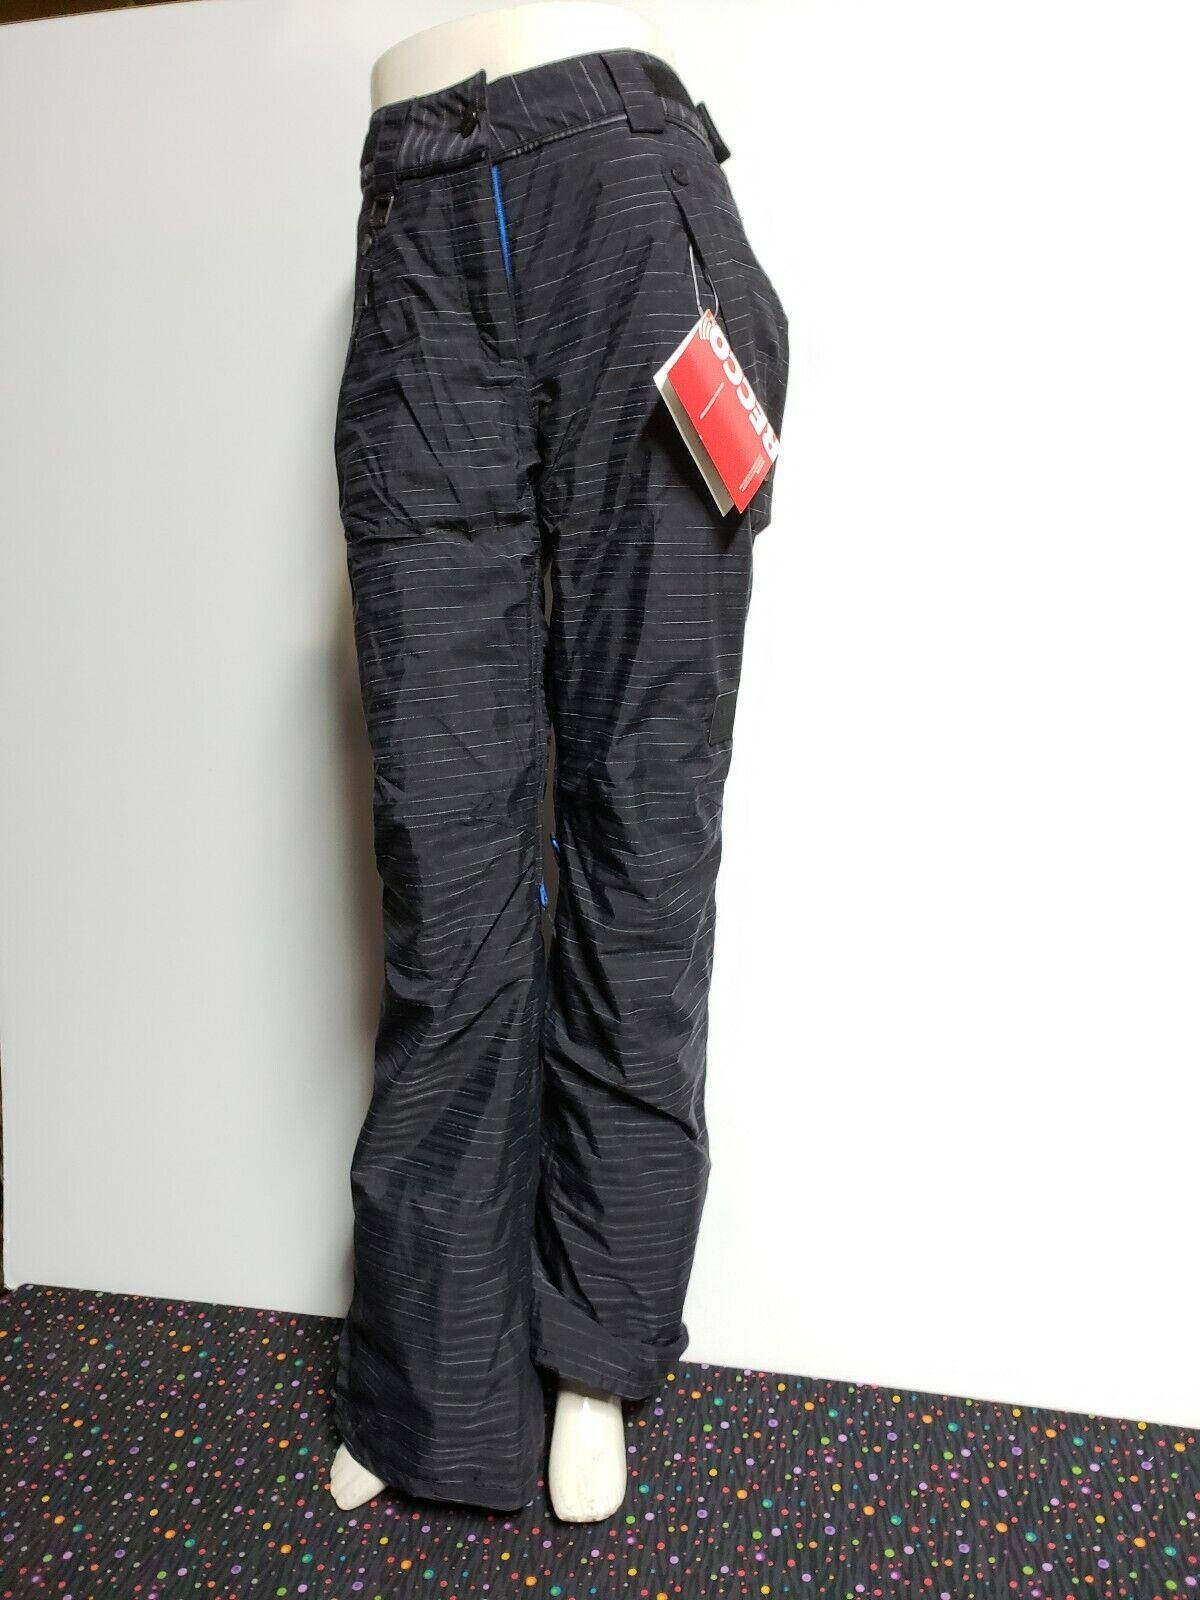 Adidas W SLUB STRIPE P G88910 Snowboarding Pants Women's Size S, RECCO, NWT